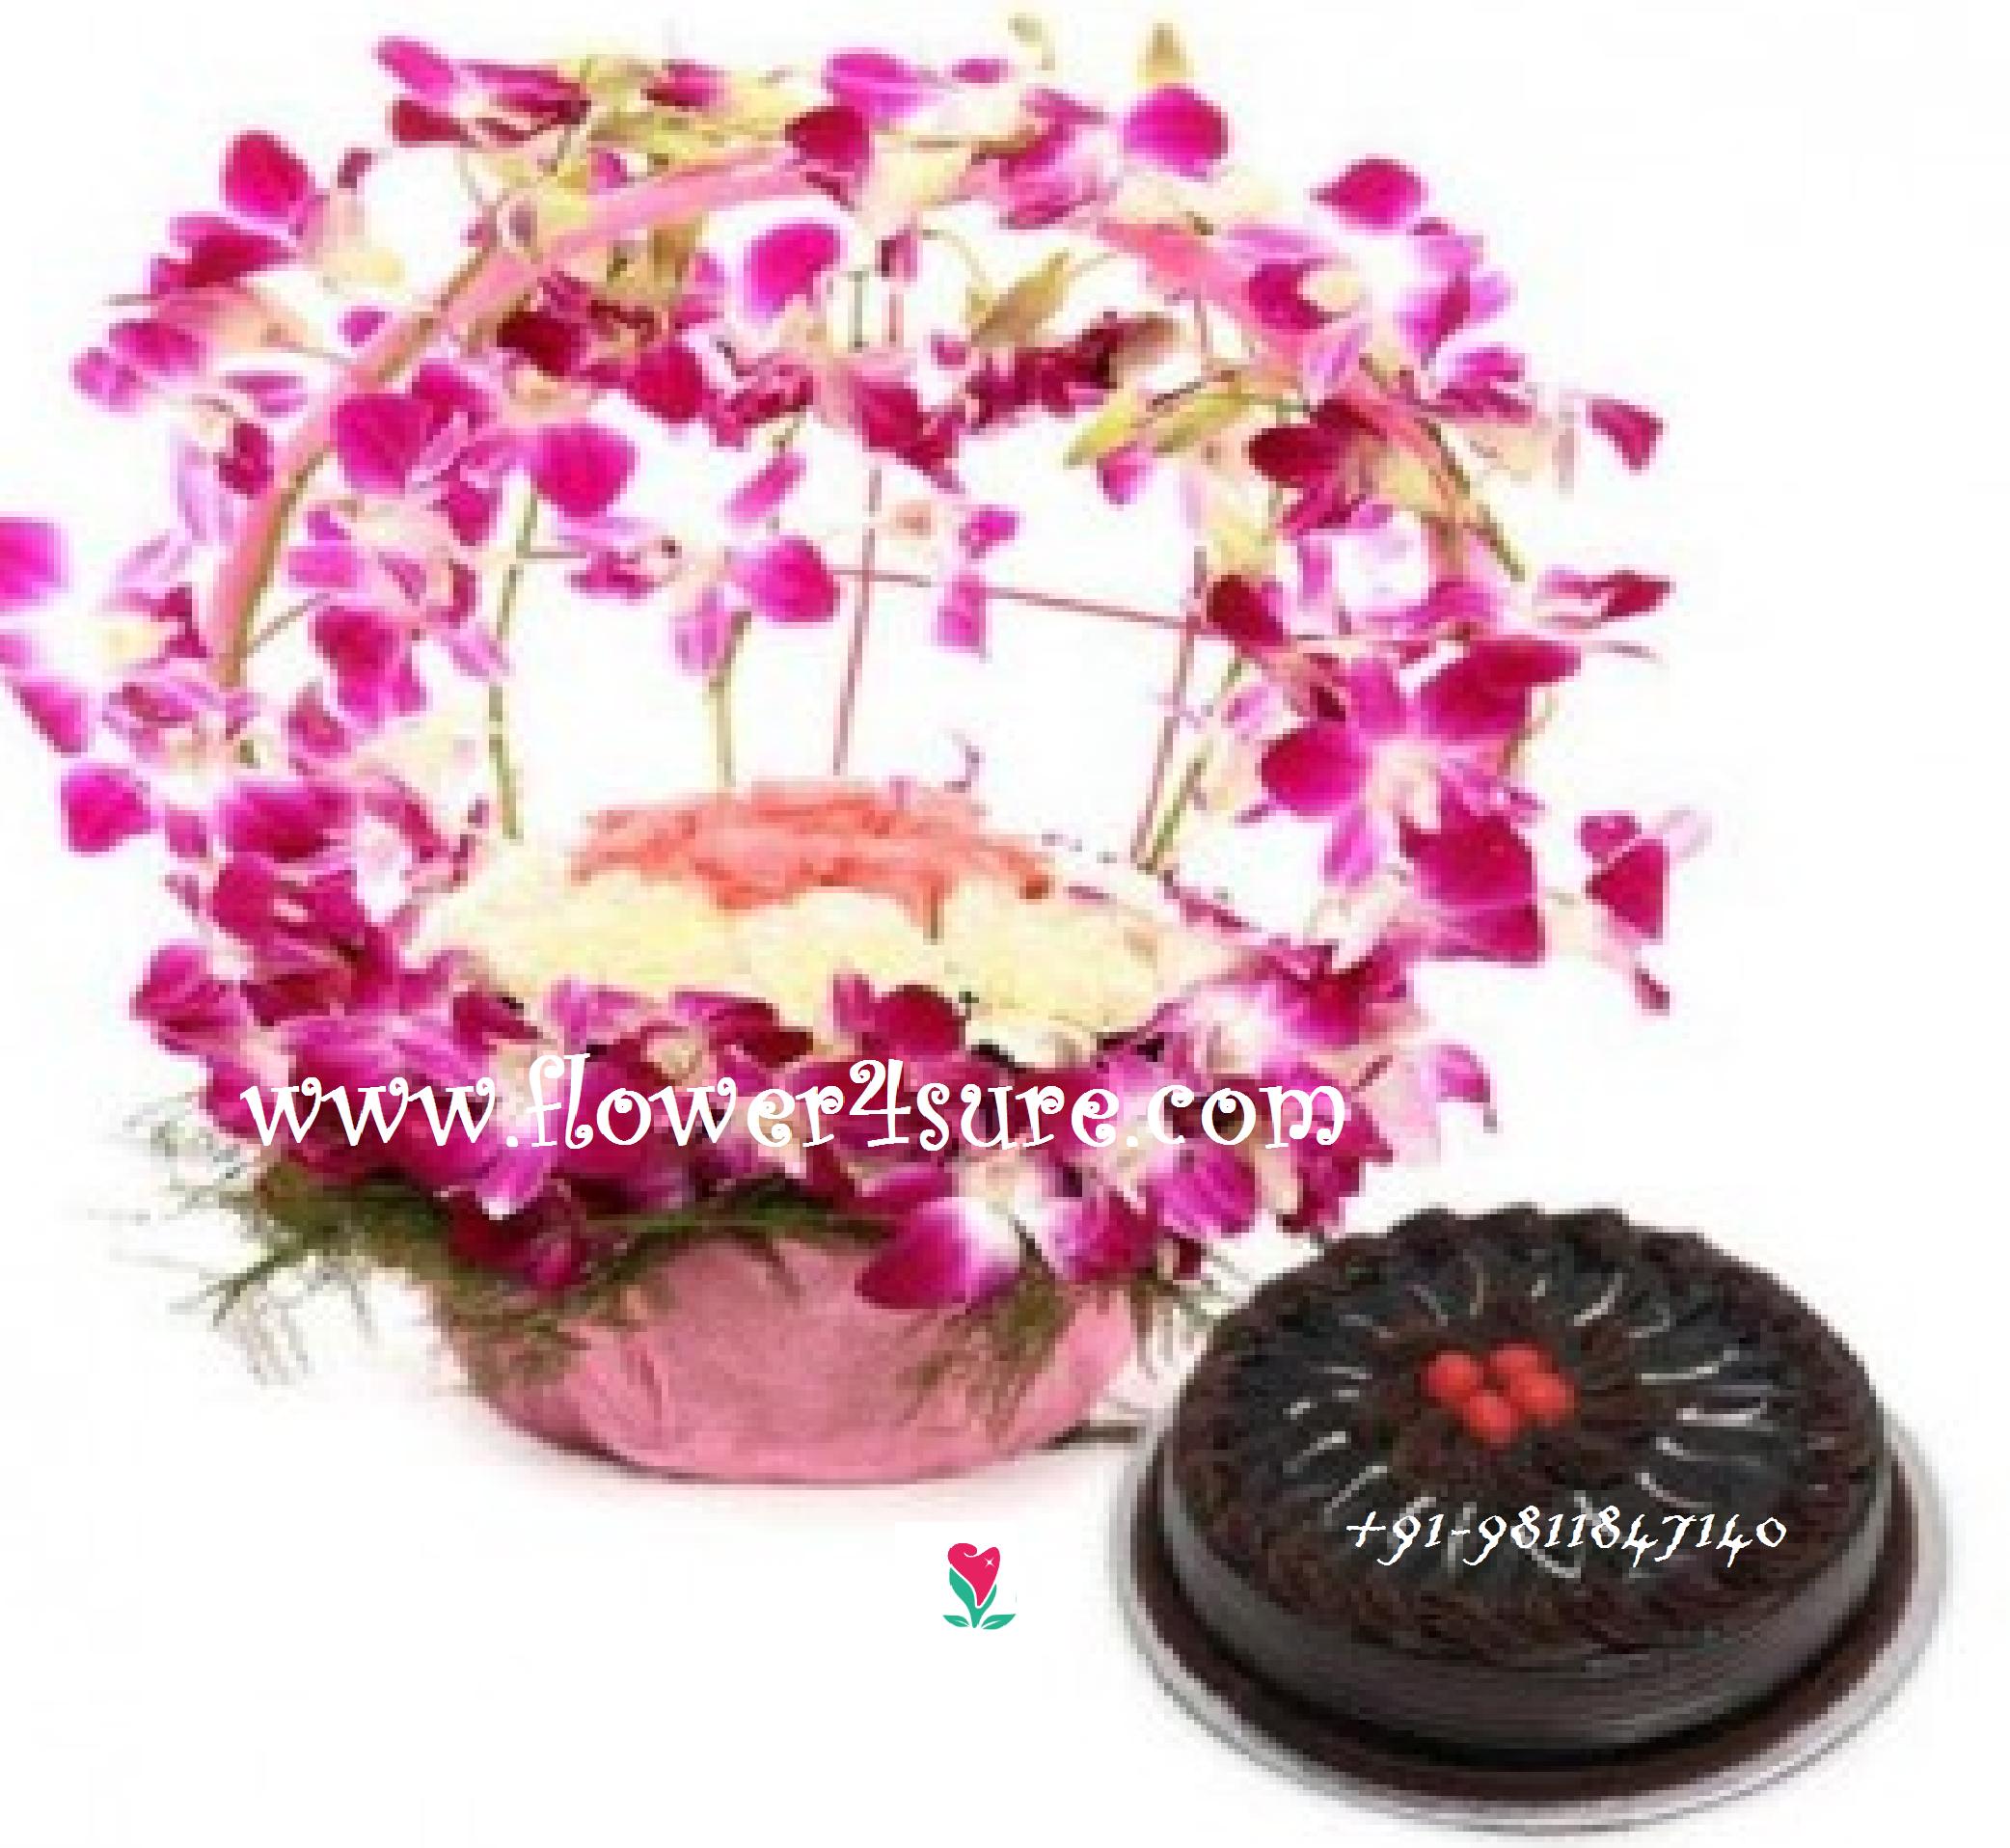 Looking For Best Flowers Shop In Delhi To Order Flowers Online